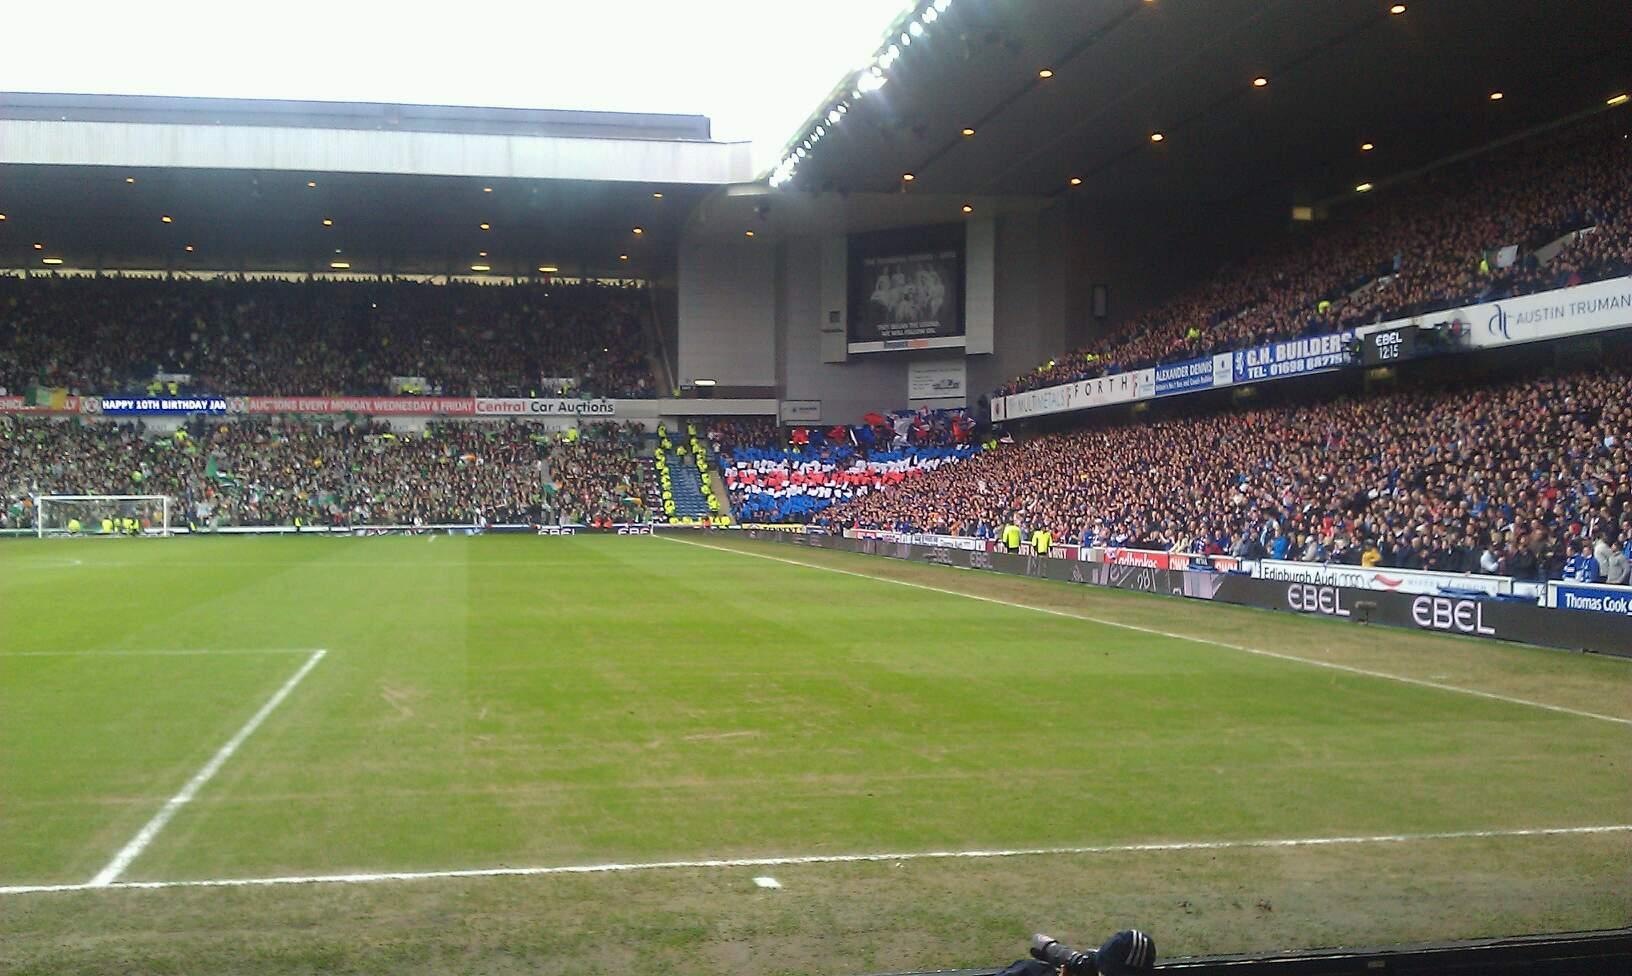 Ibrox Stadium Section cf1 Row e Seat 45